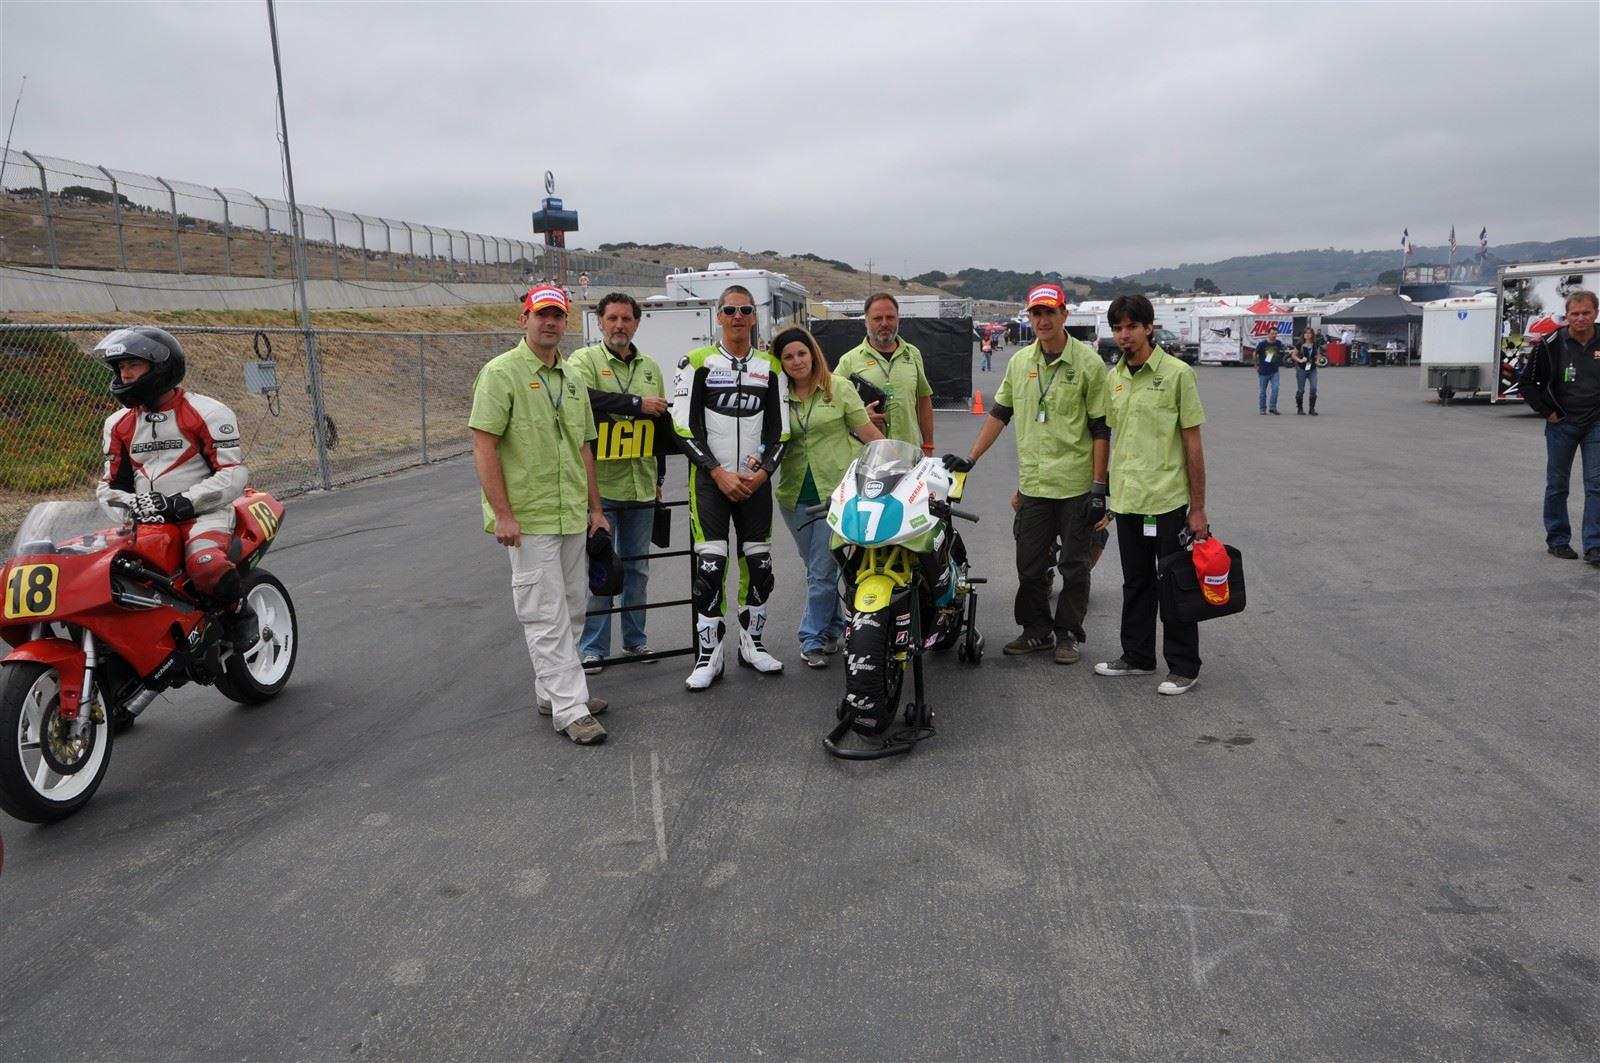 Team LGN race day